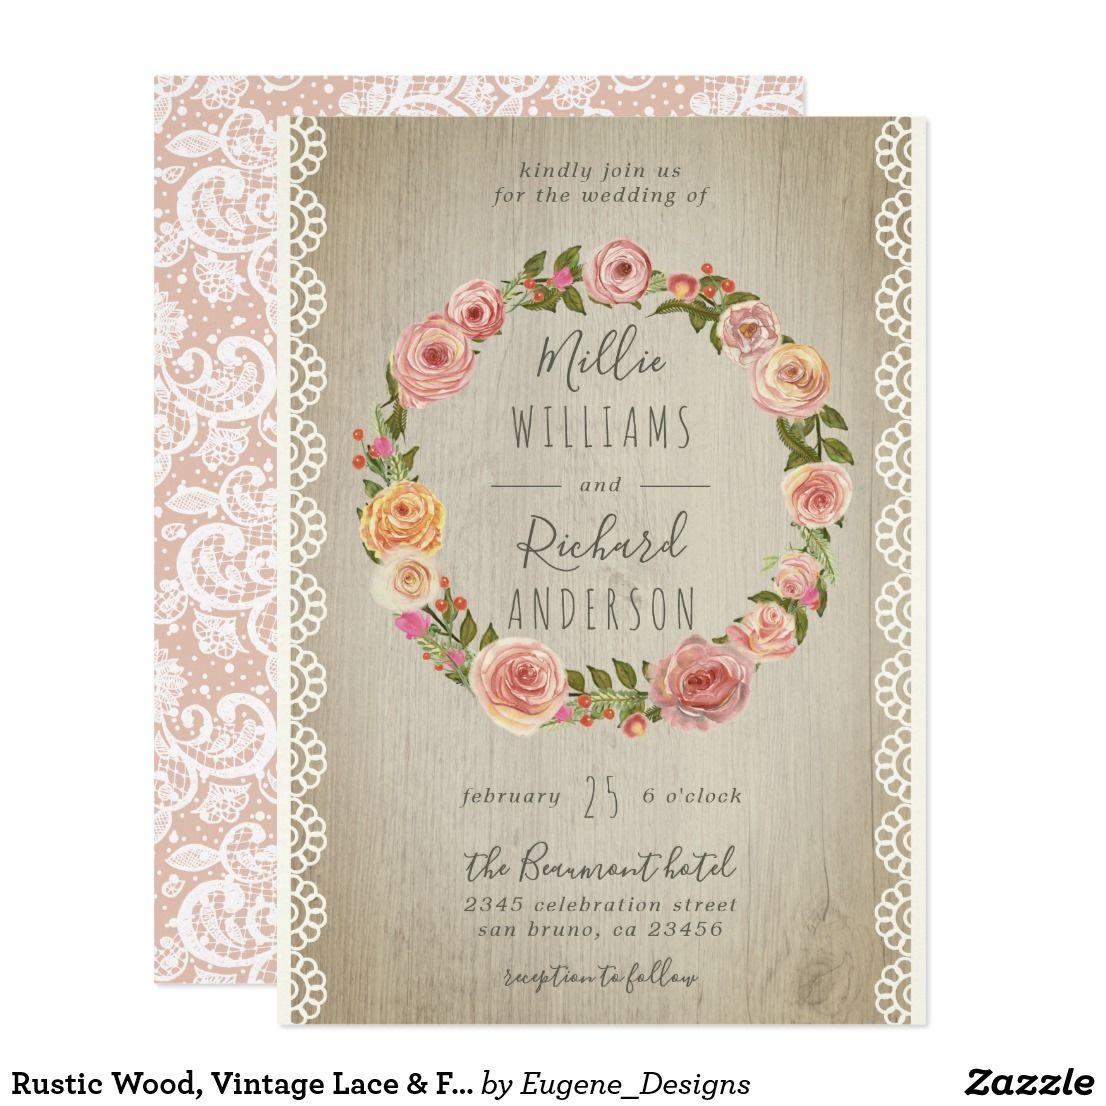 Rustic Wood Vintage Lace Floral Wreath Wedding Invitation: Rustic Wood Floral Wedding Invitations At Reisefeber.org